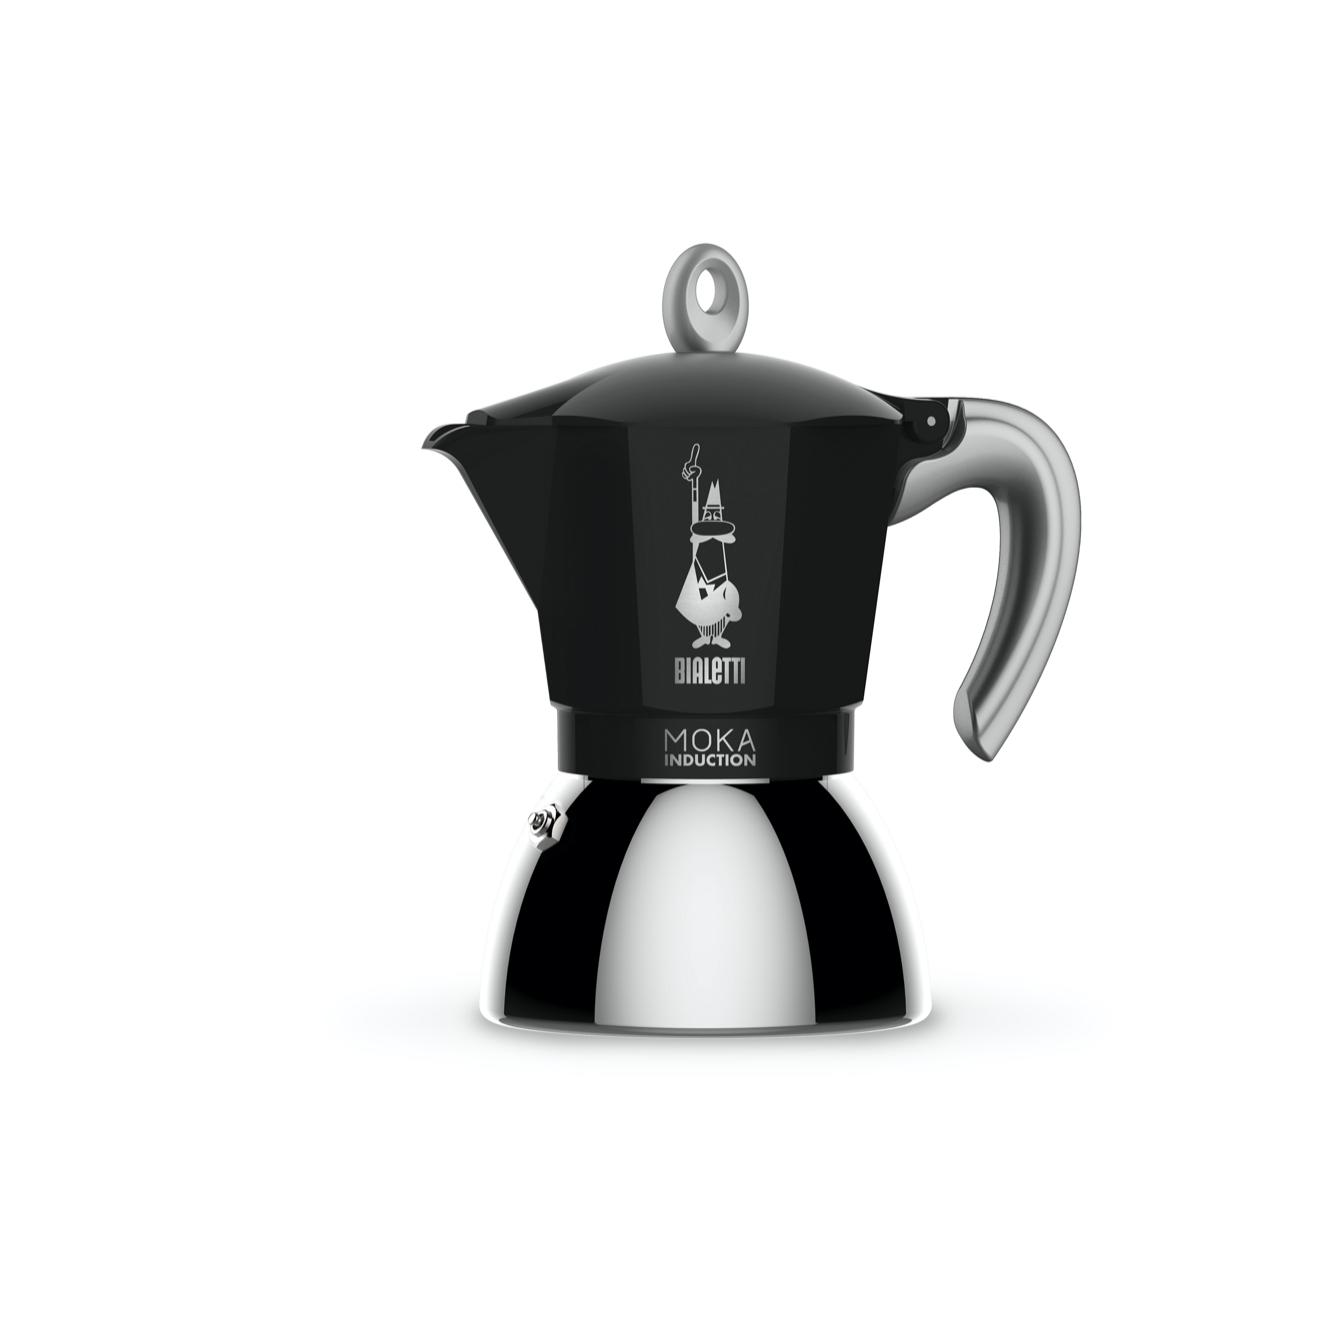 Bialetti - Moka Induction Edition 2.0 - 4 Cups - Black (6934)